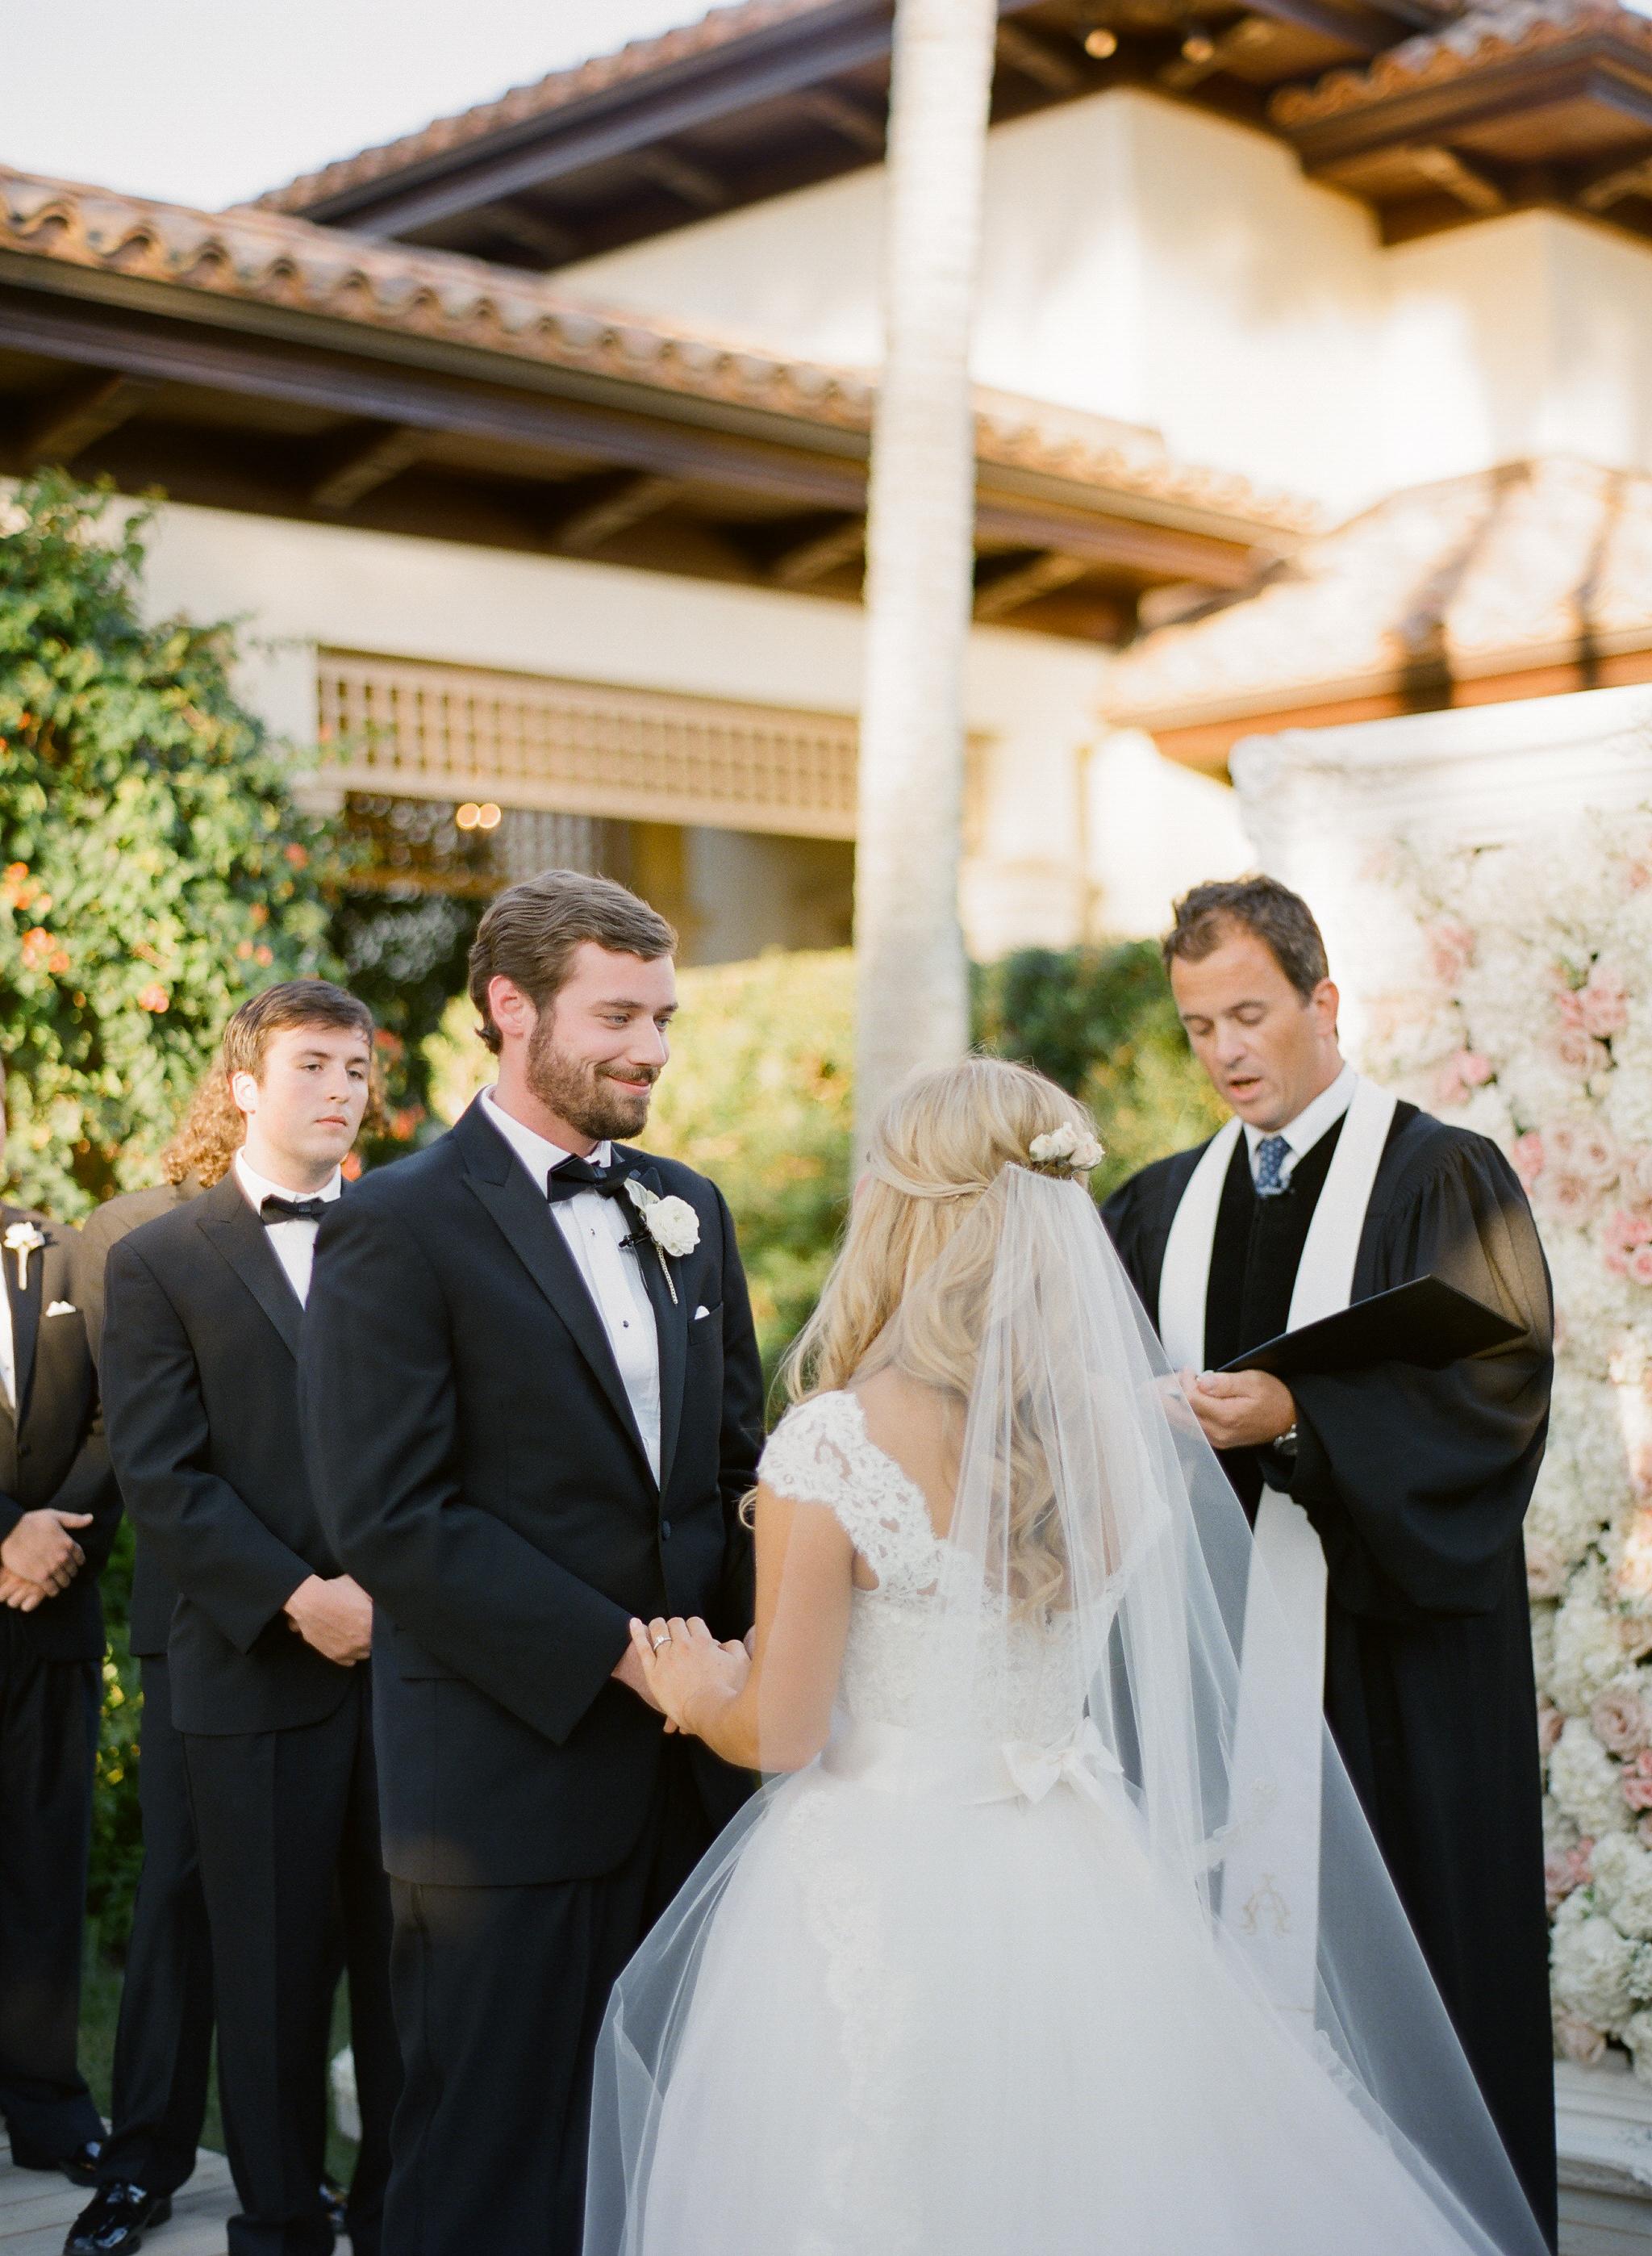 Ceci_New_York_Florida_Wedding_Style_Bride_Watercolor_Real_Custom_Luxury_75.jpg